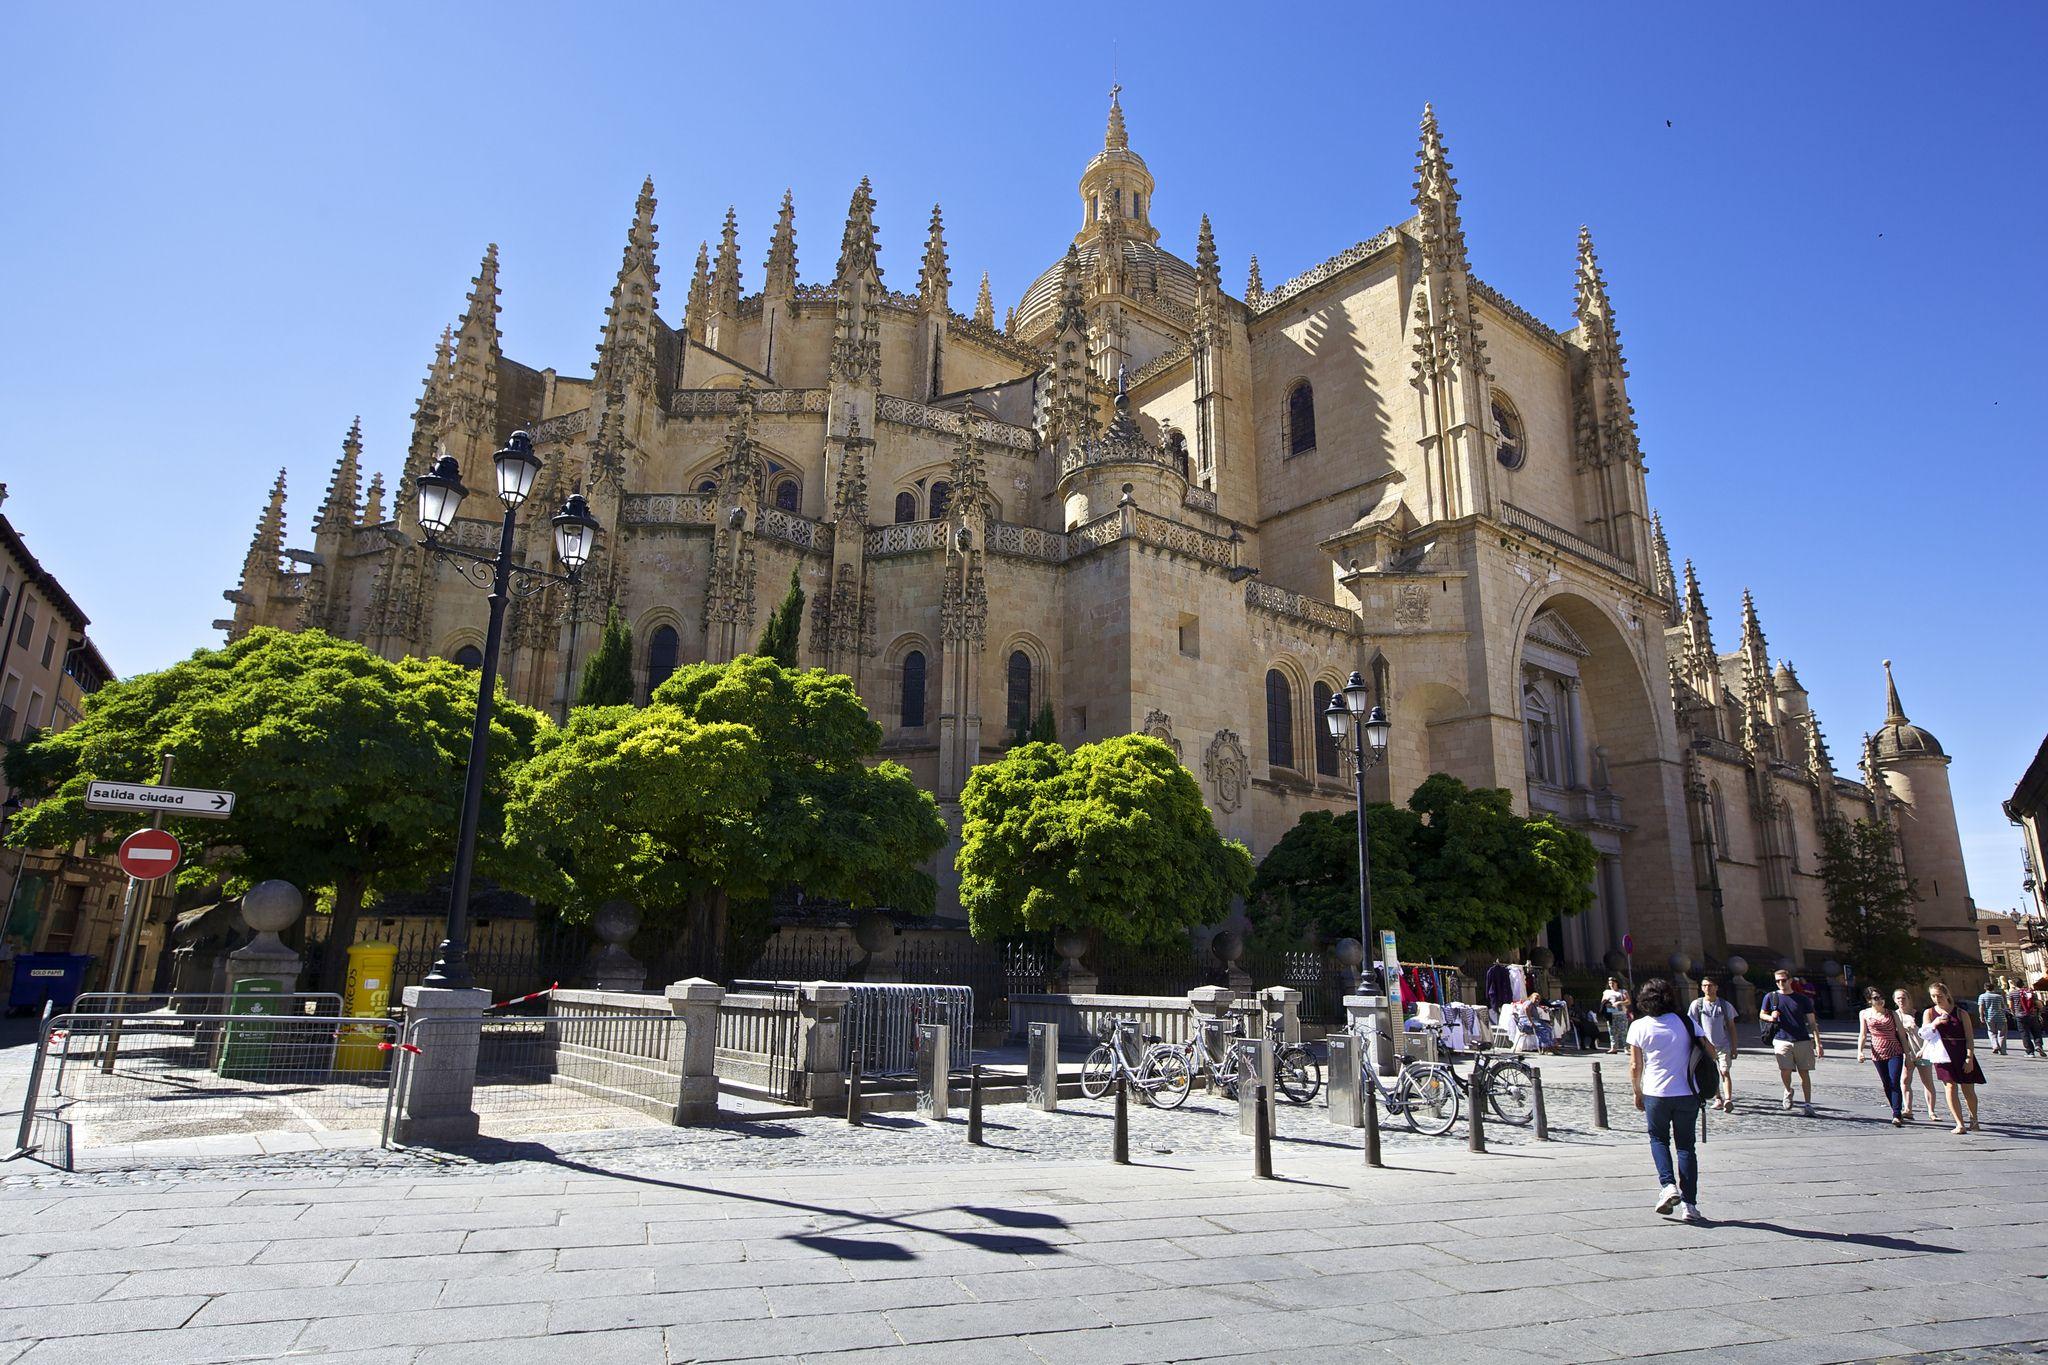 Catedral de Santa María de Segovia, España   Flickr - Photo Sharing!